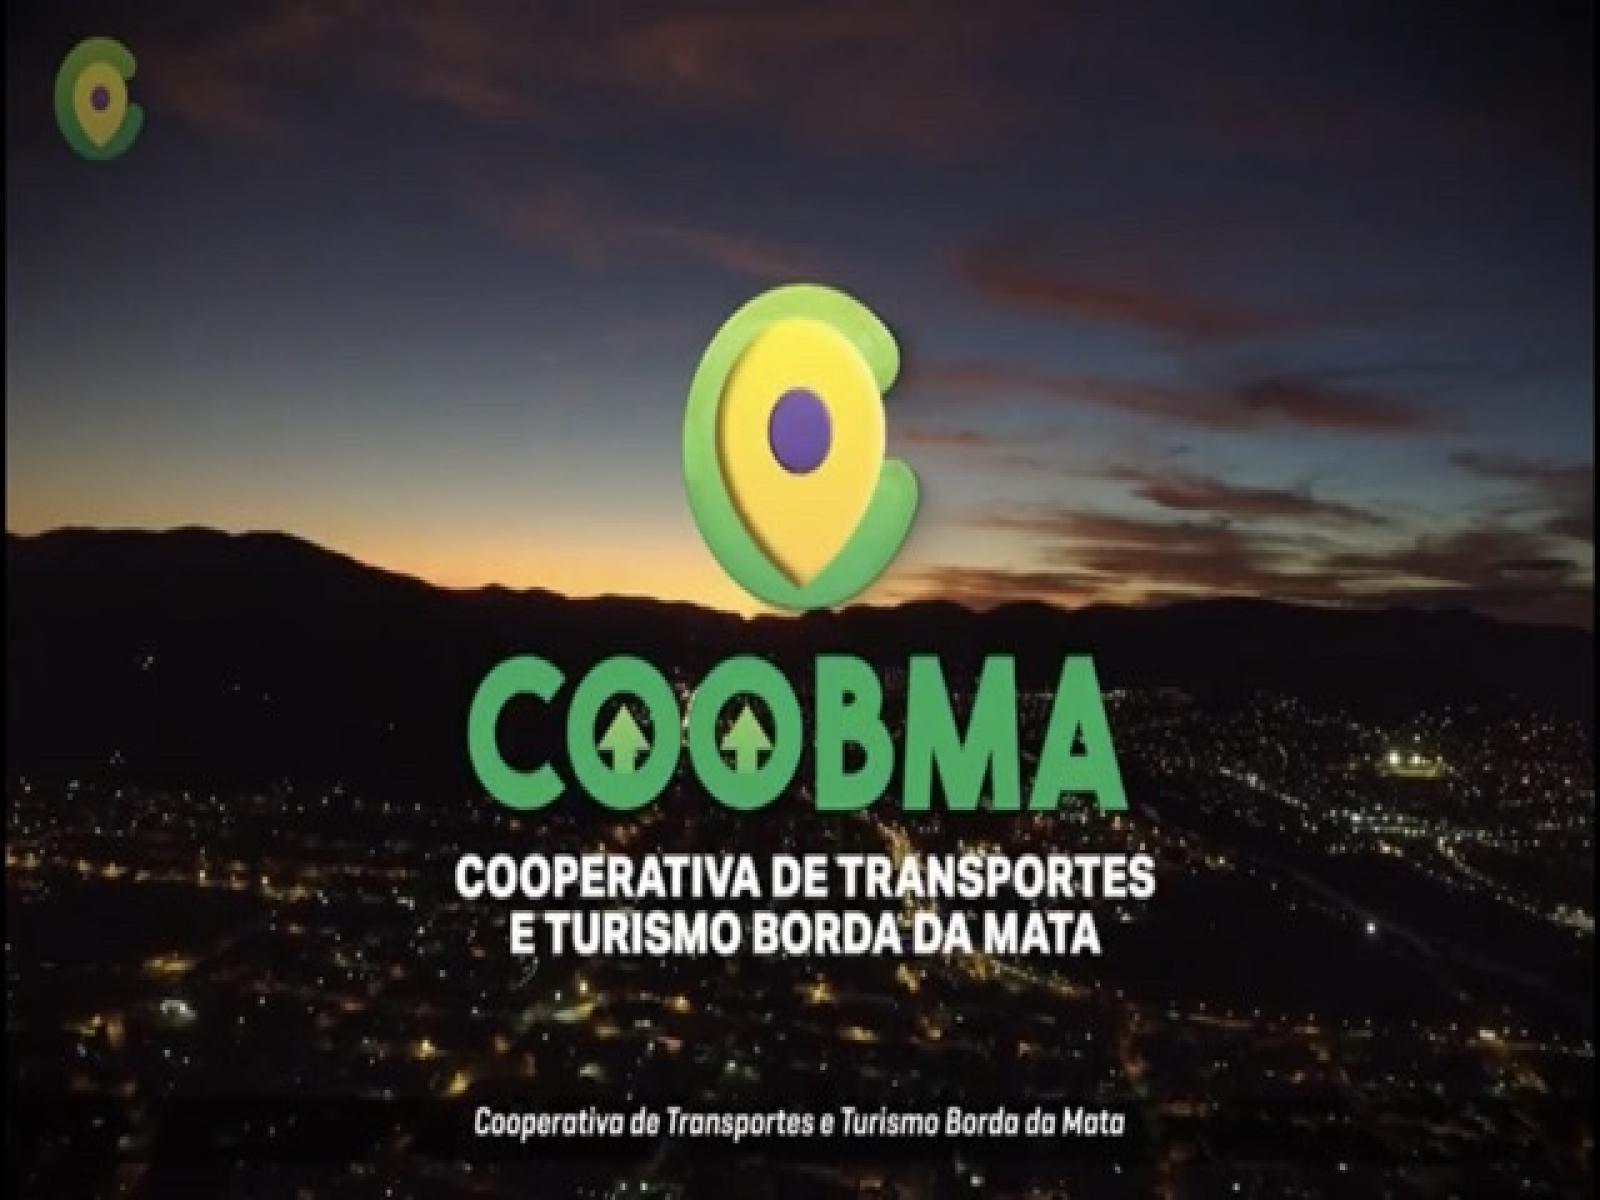 COOBMA Cooperativa de Transportes e Turismo Borda da Mata